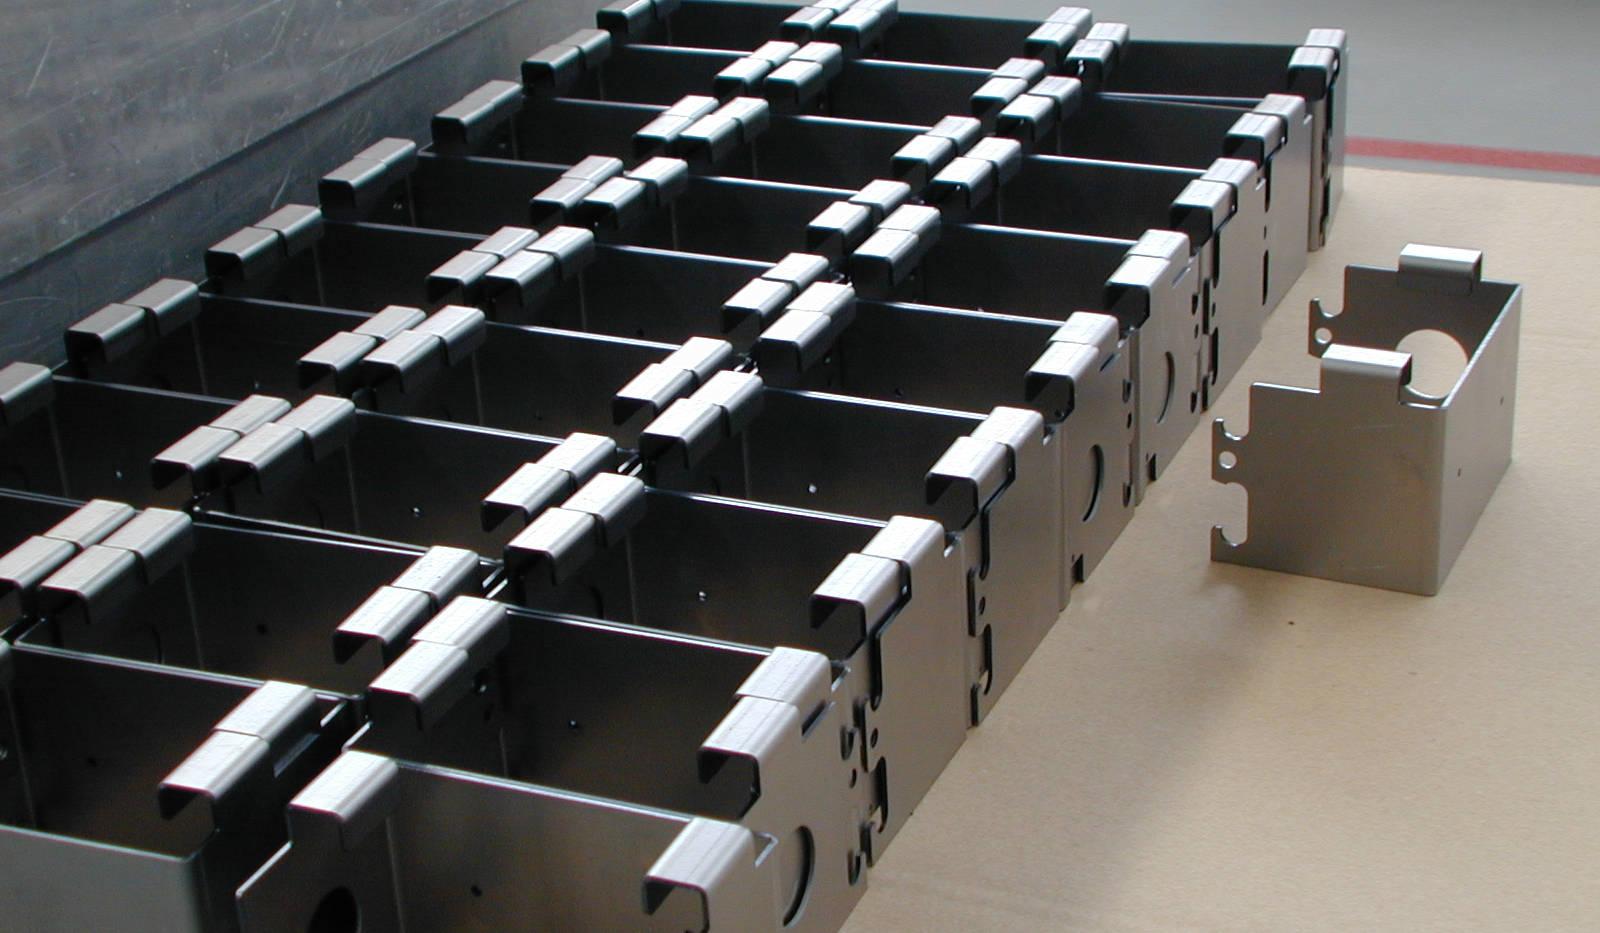 Sheetmetal Cut and Fold - Ready for Welding